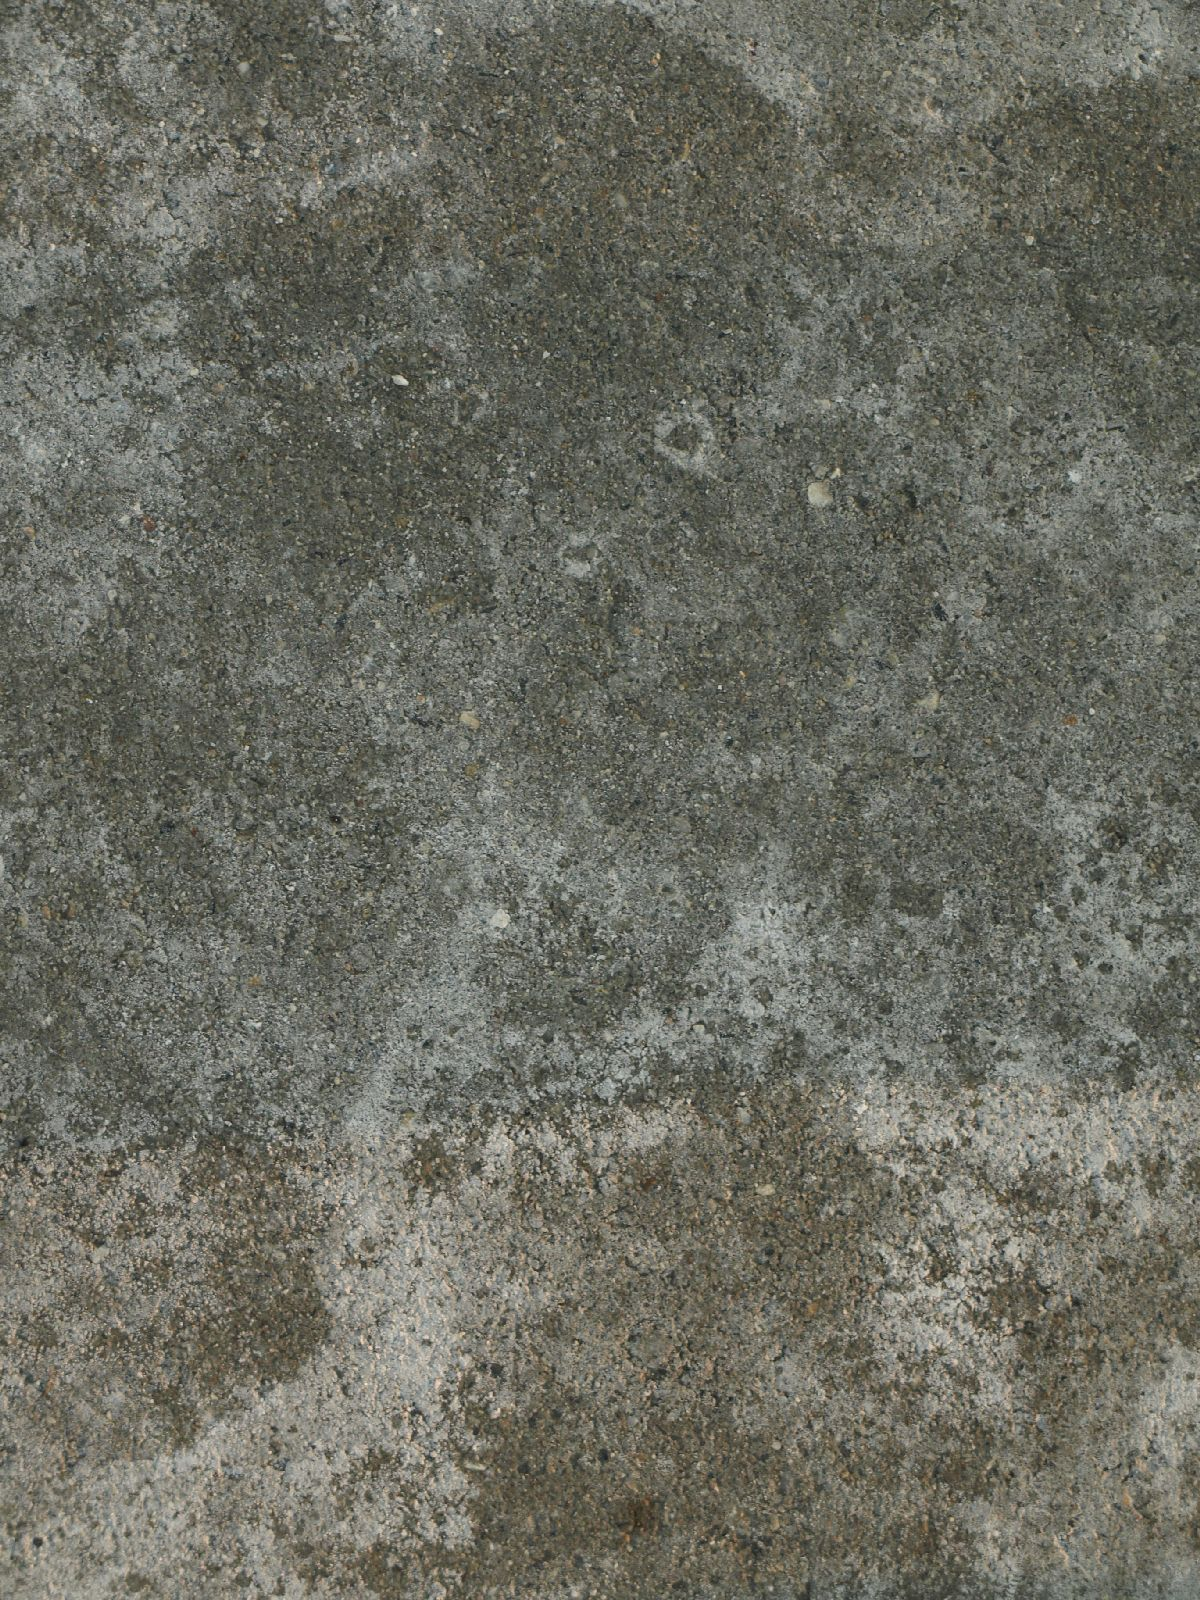 Snow_Texture_A_P1109054